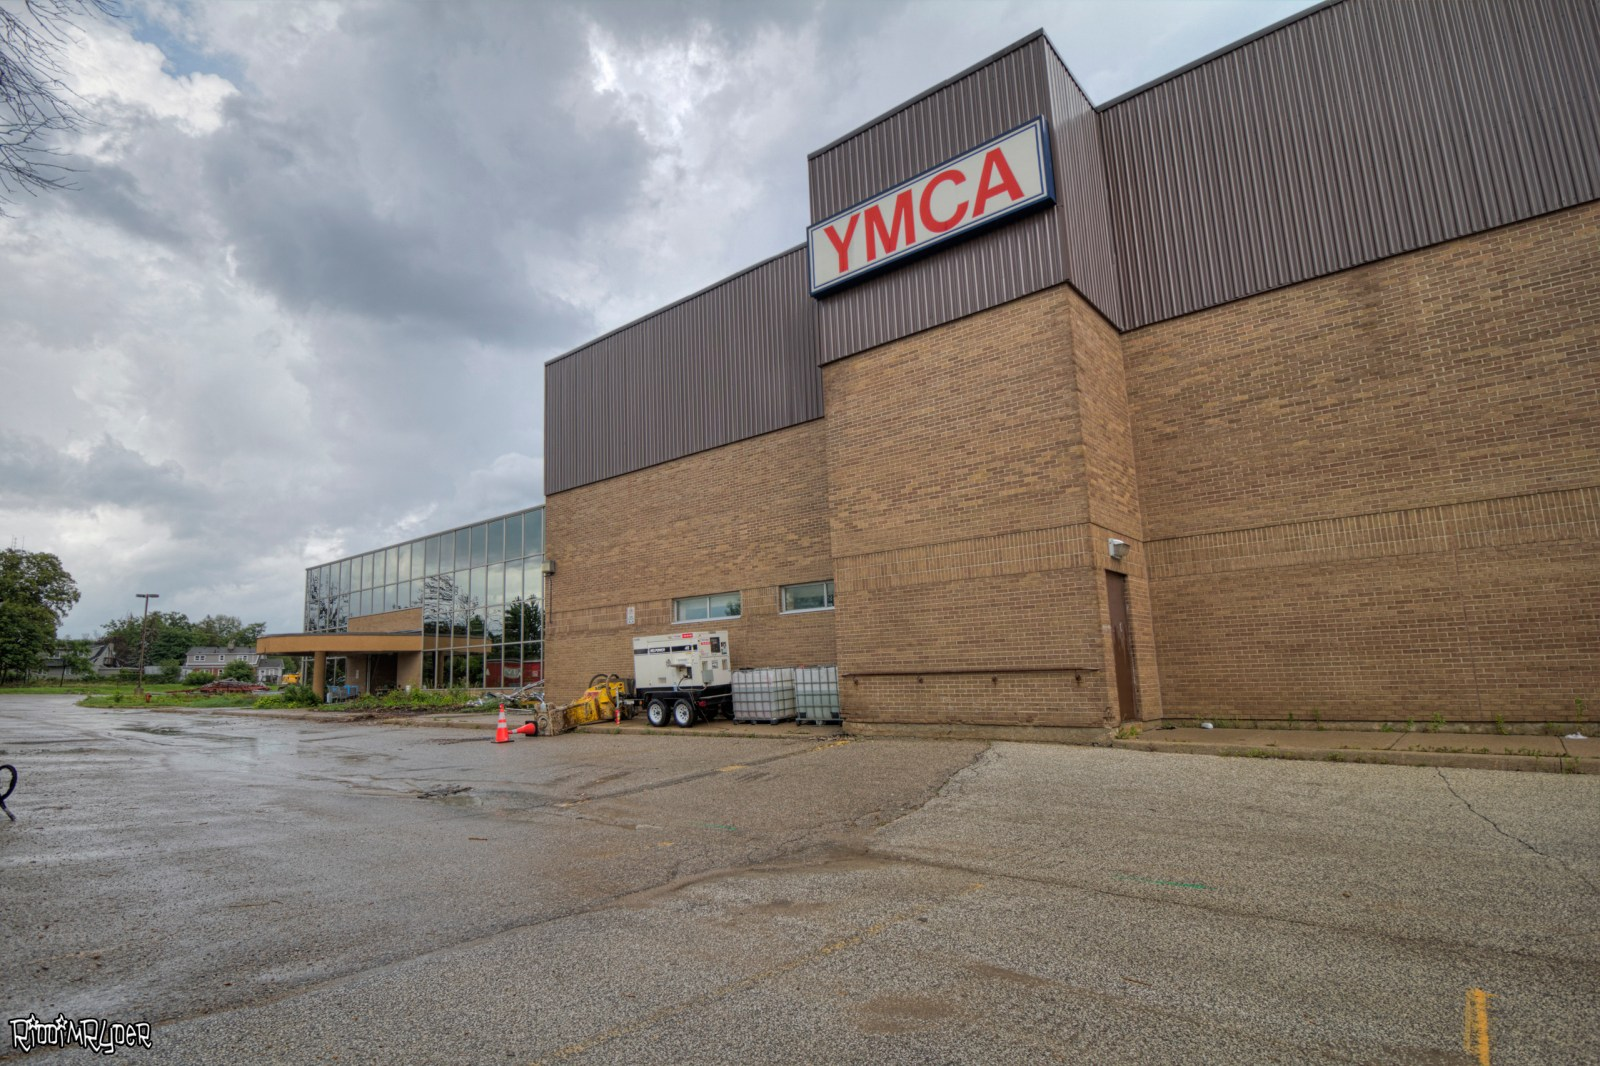 Abandoned YMCA Barrie Ontario